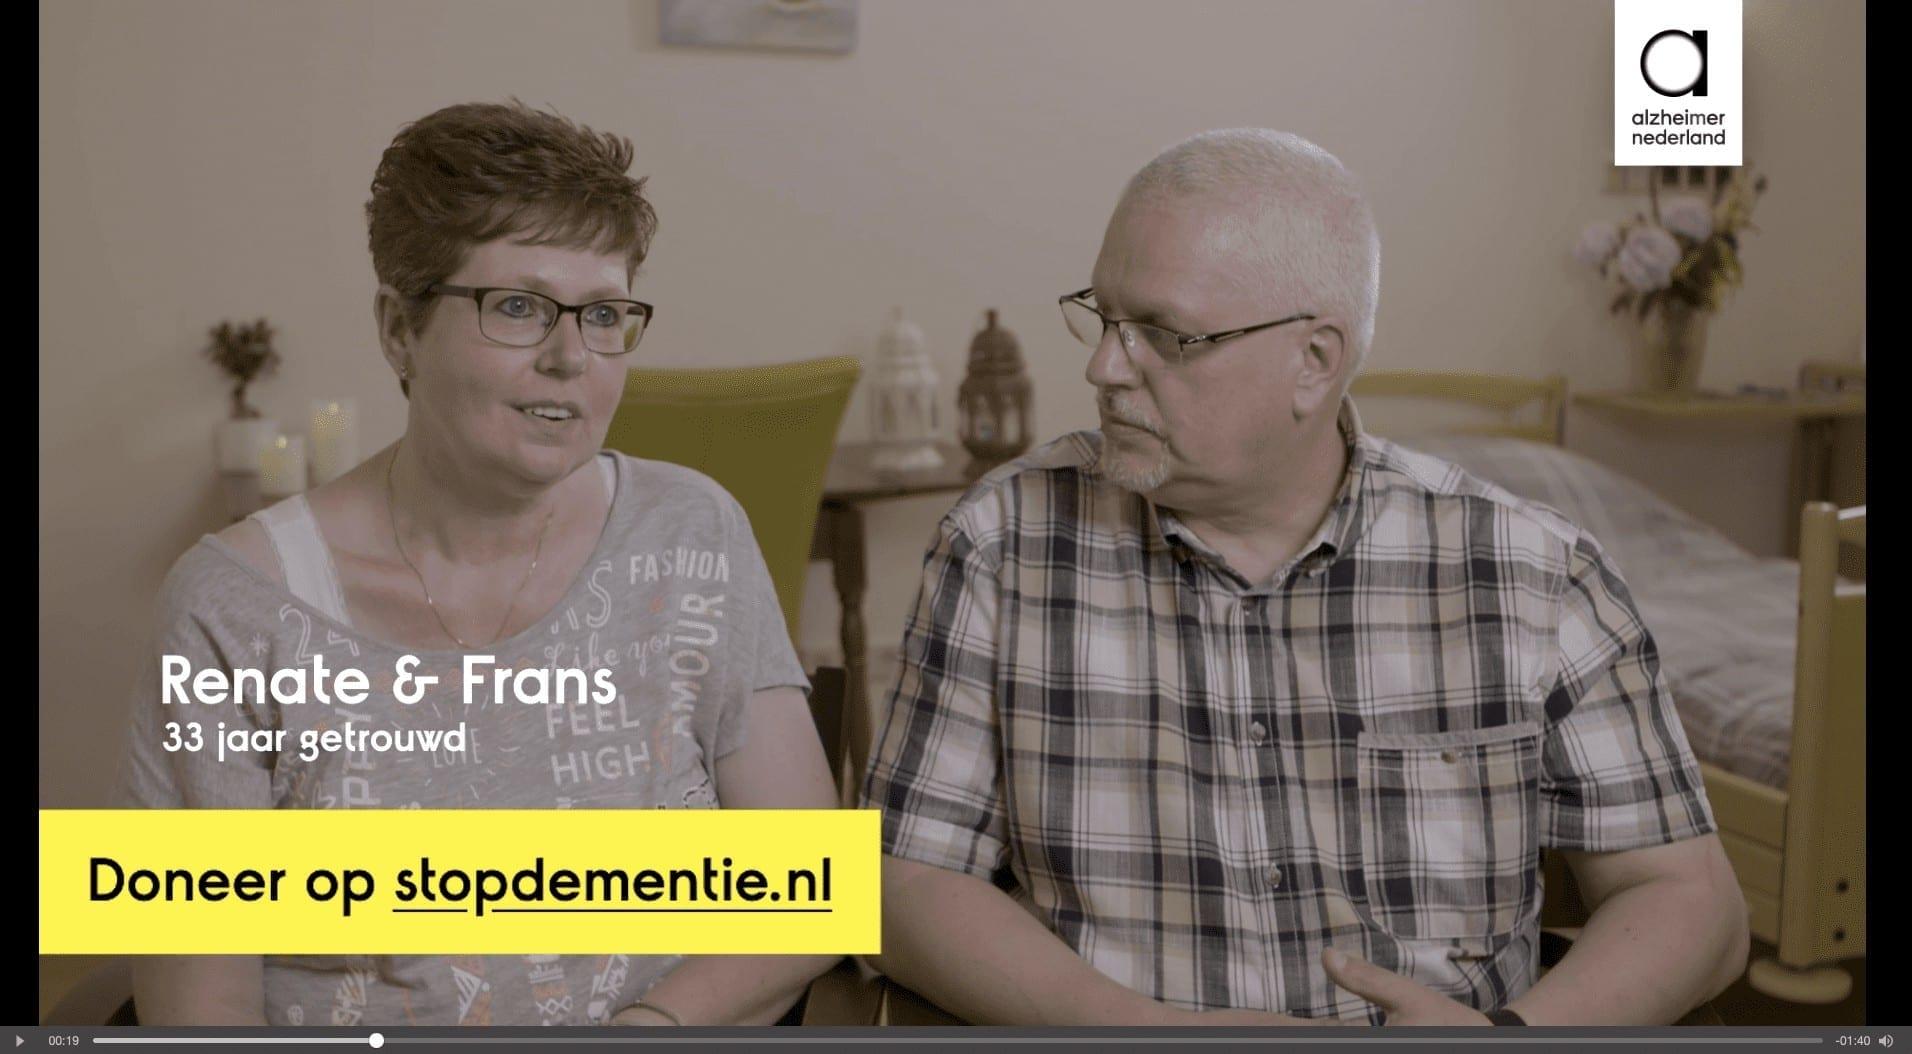 Alzheimer-Nederland DRTV Direct Response Television Frans